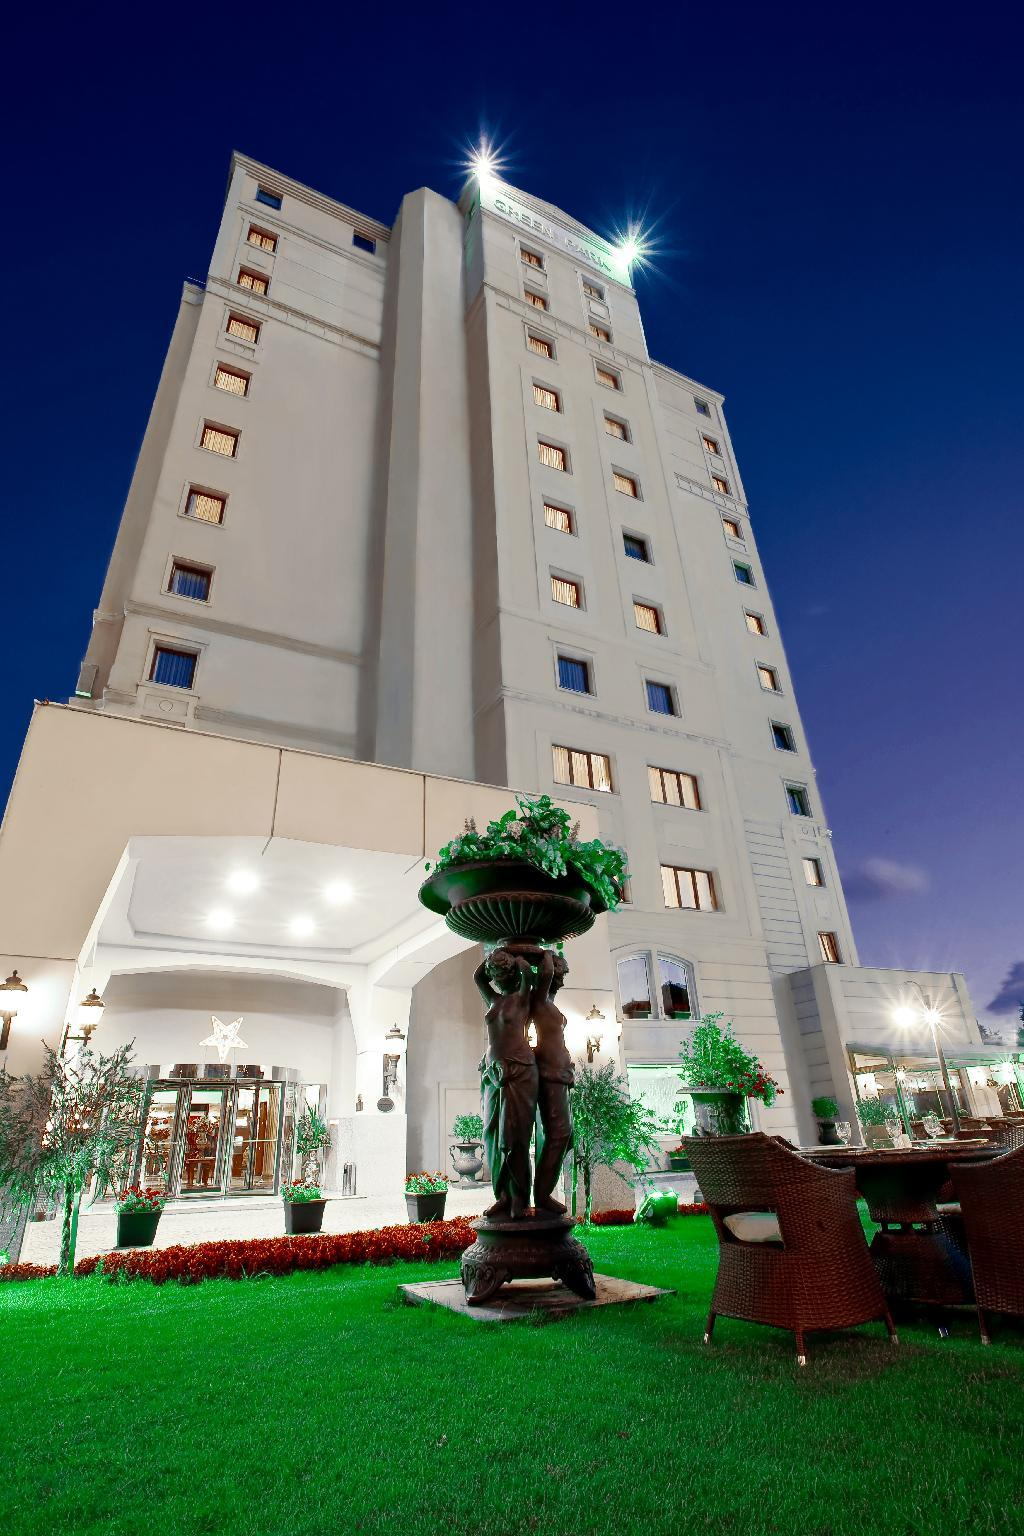 The Green Park Bostanci Hotel